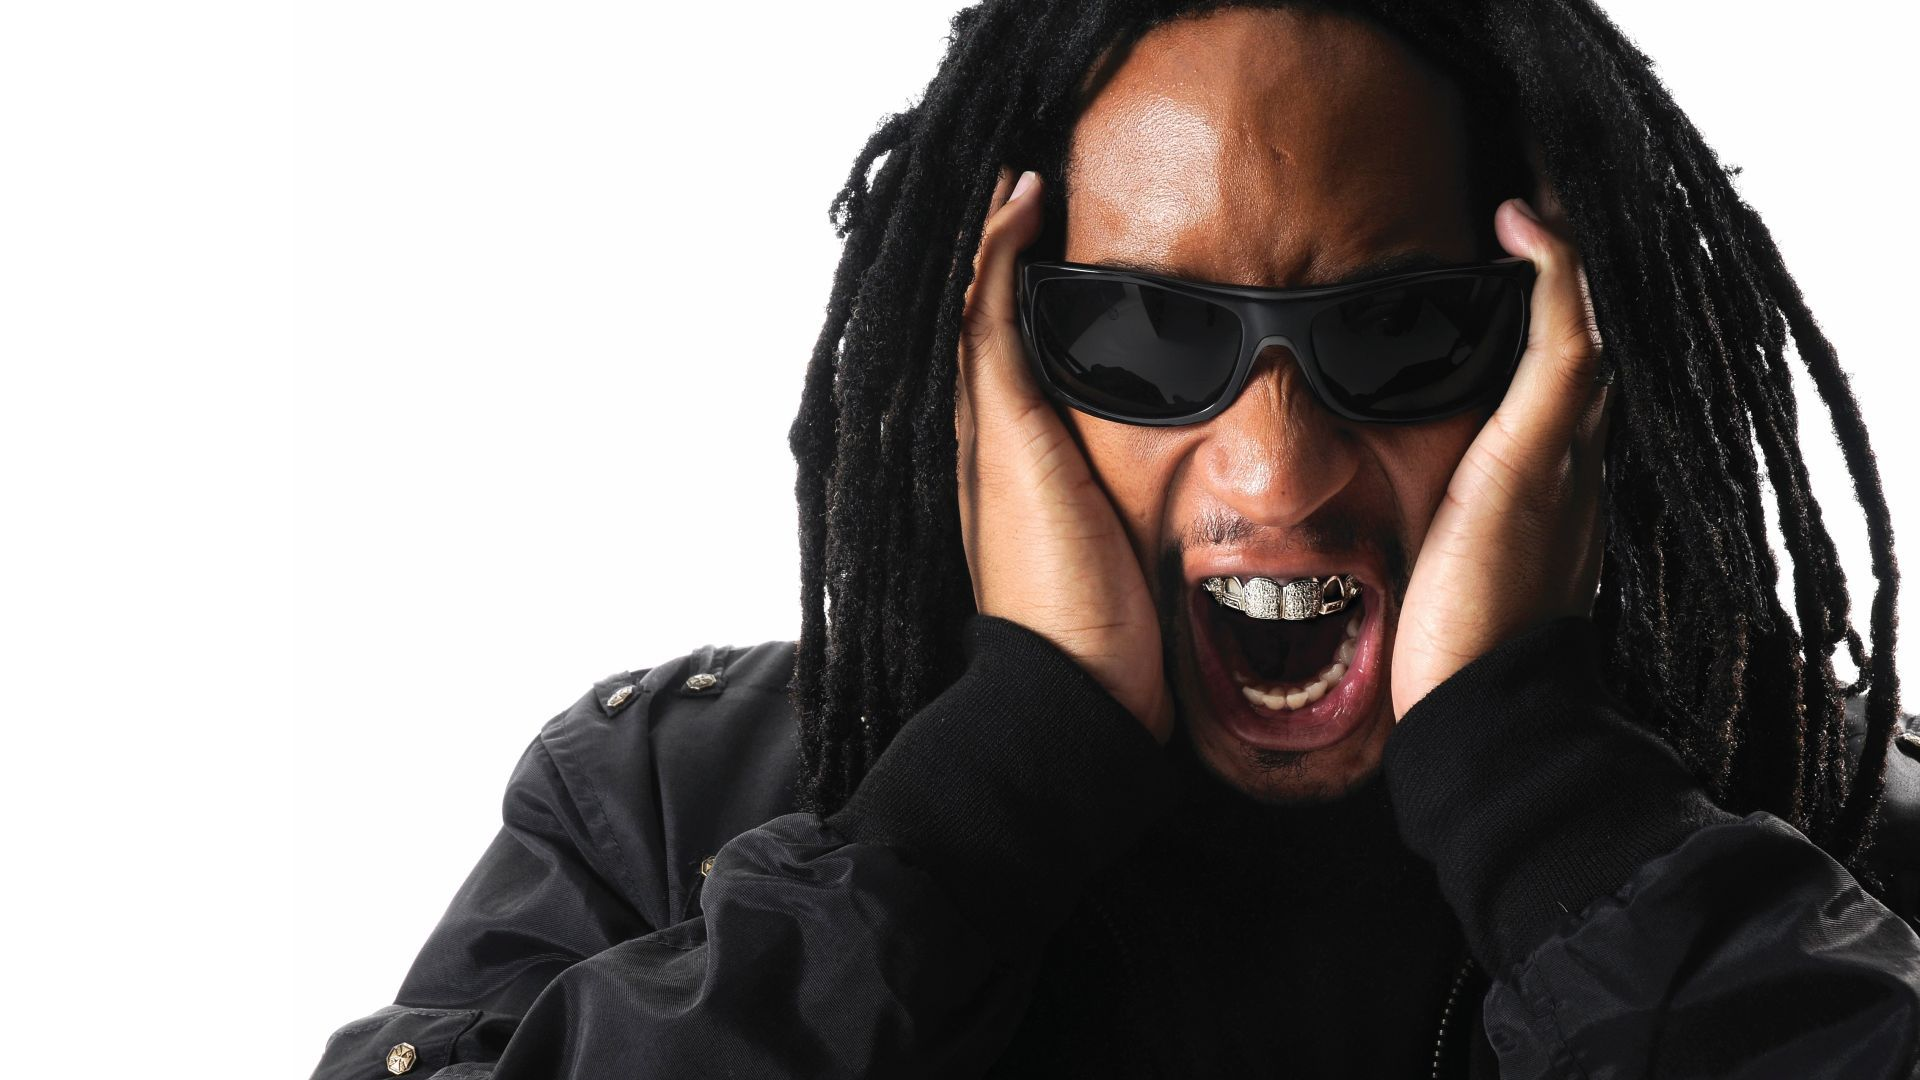 Lil Jon Hd Background